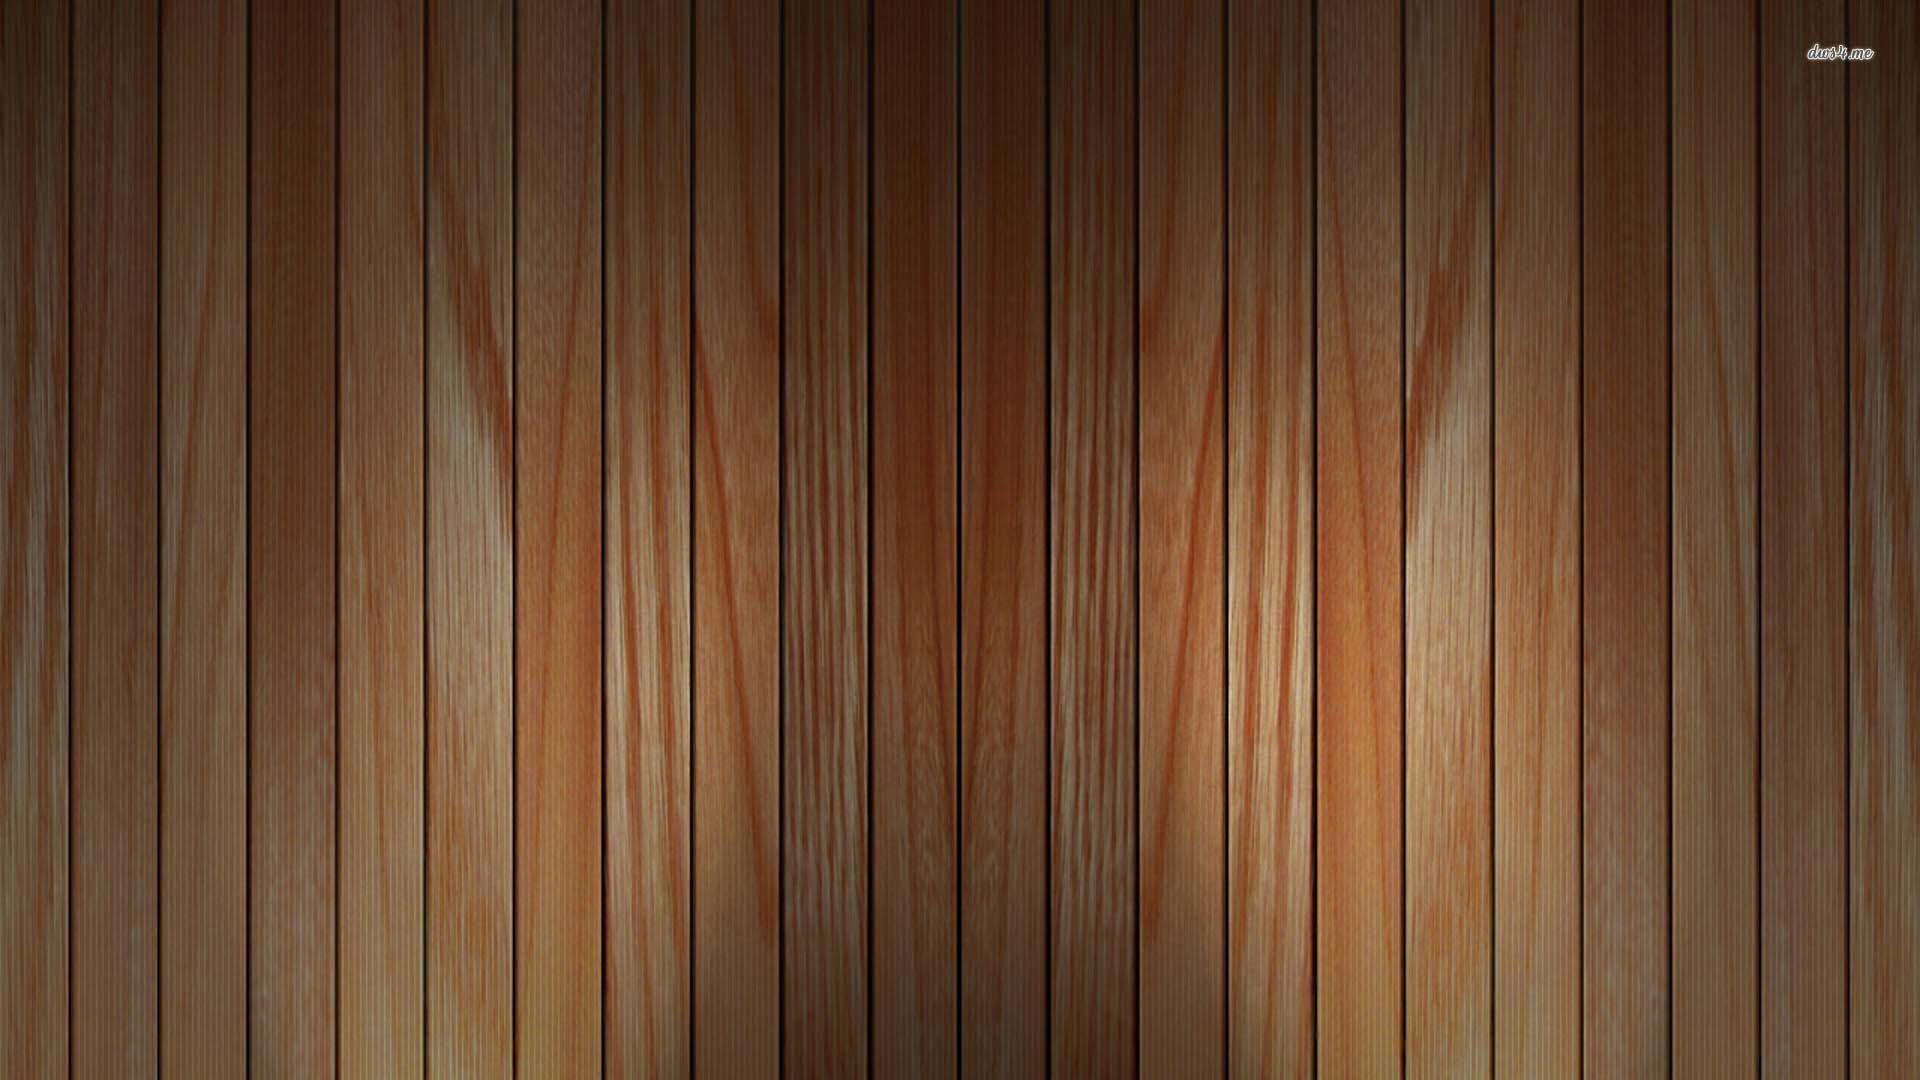 Res: 1920x1080, wood floor wallpaper HD